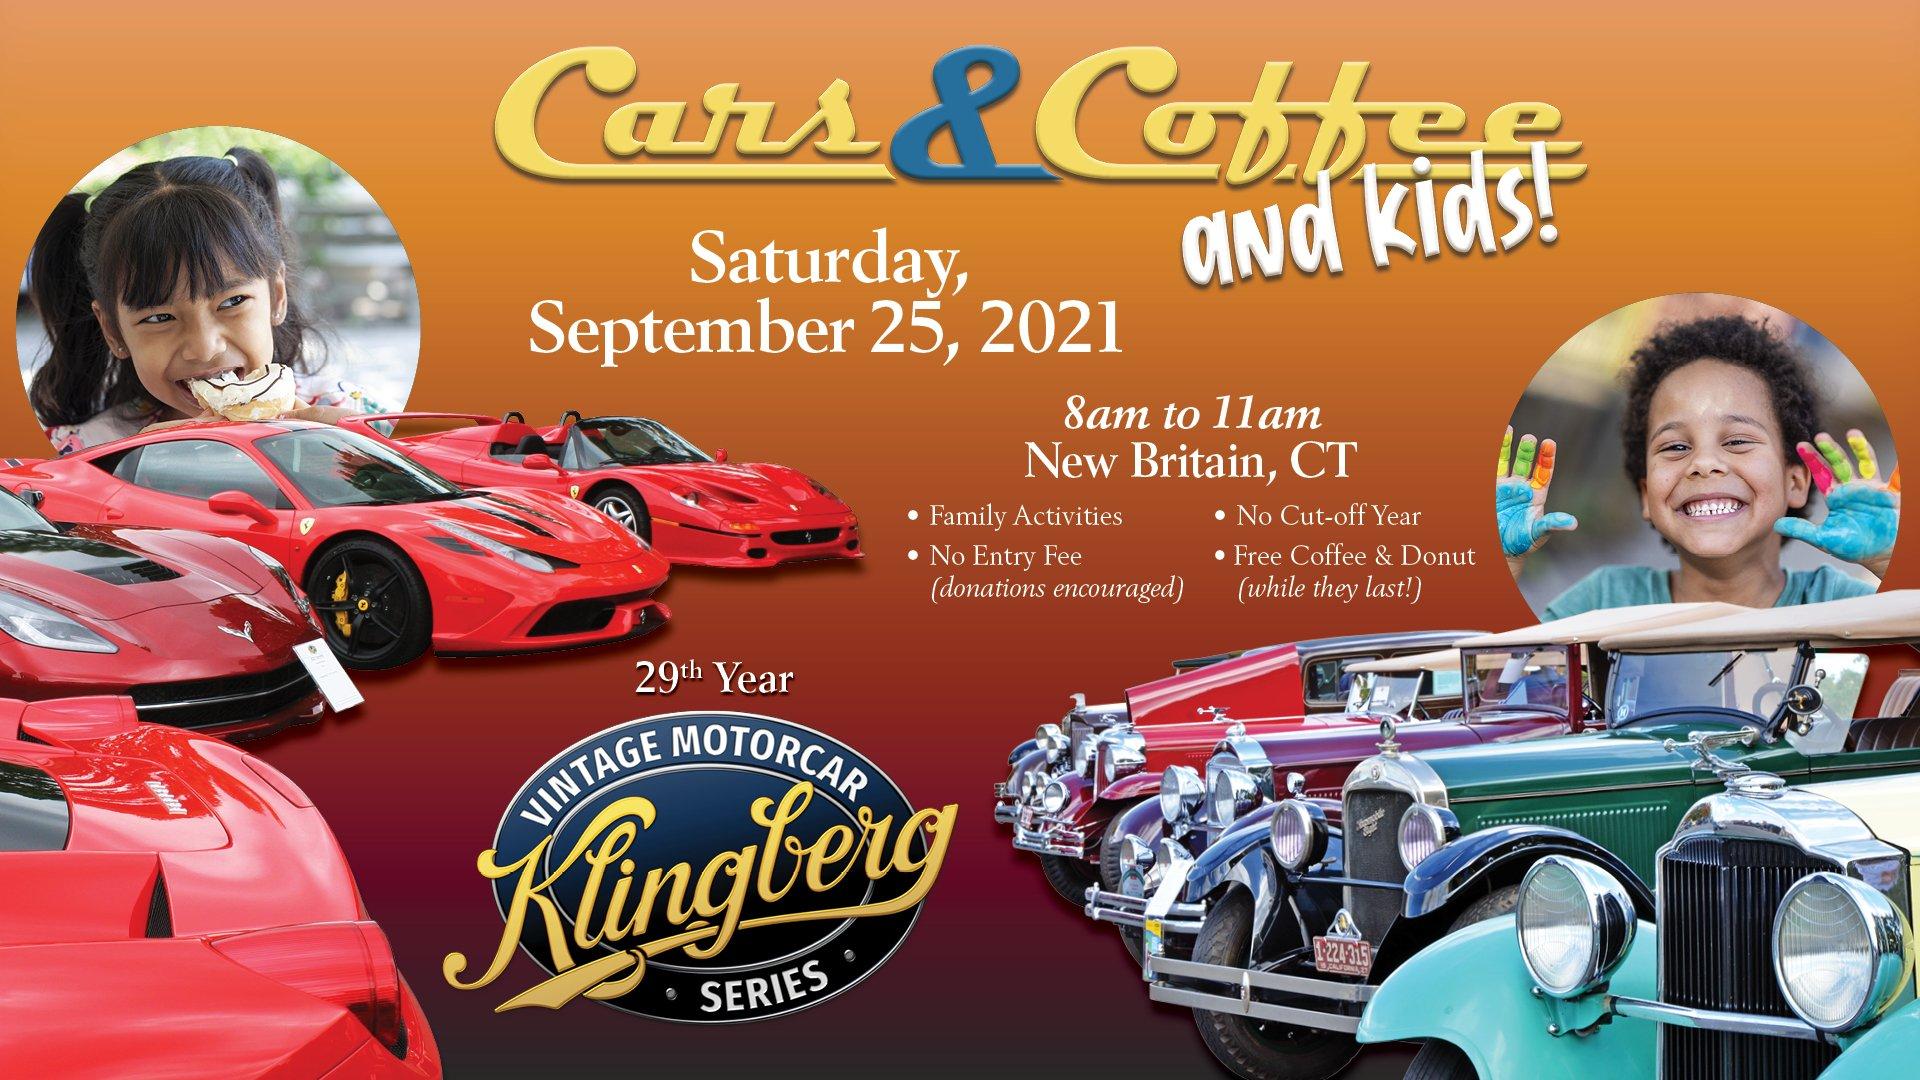 Cars & Coffee & Kids - Sept 25, 2021